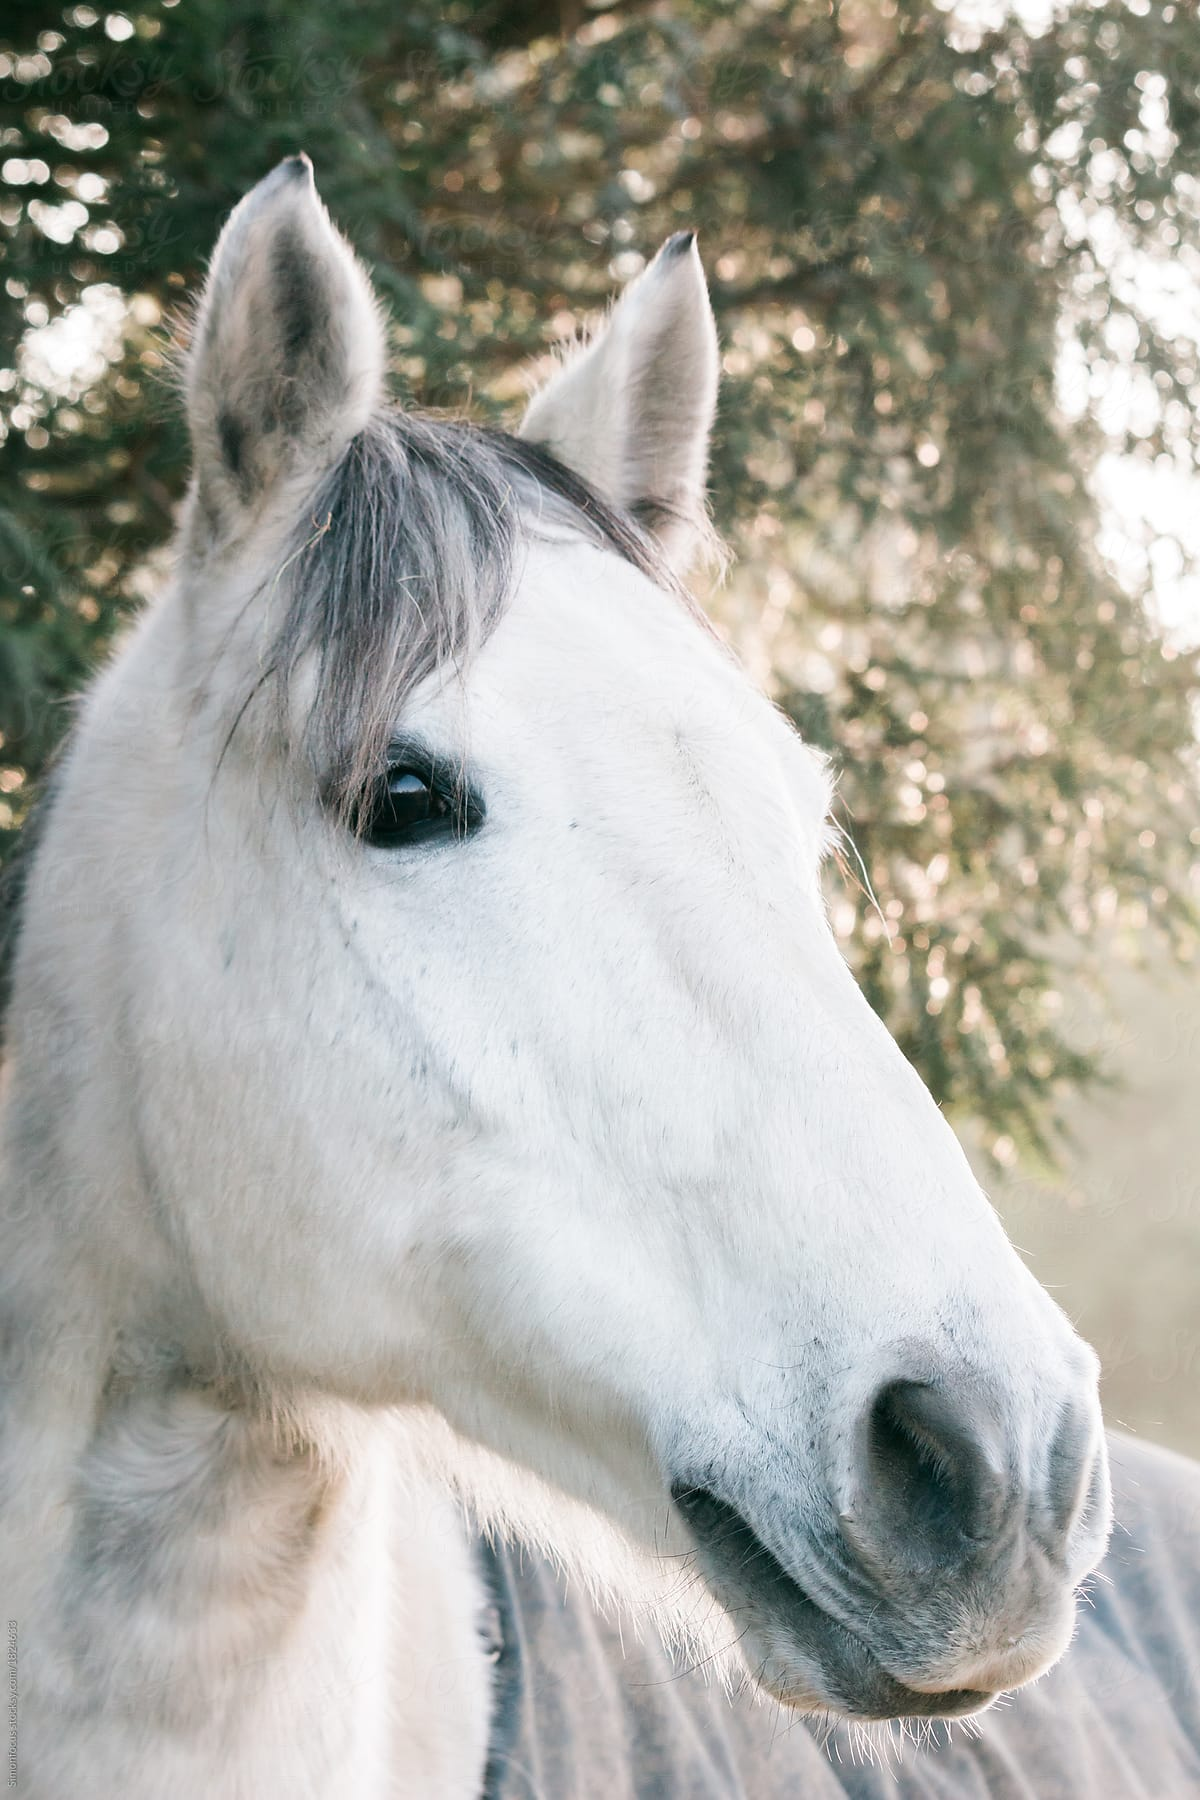 White horses head